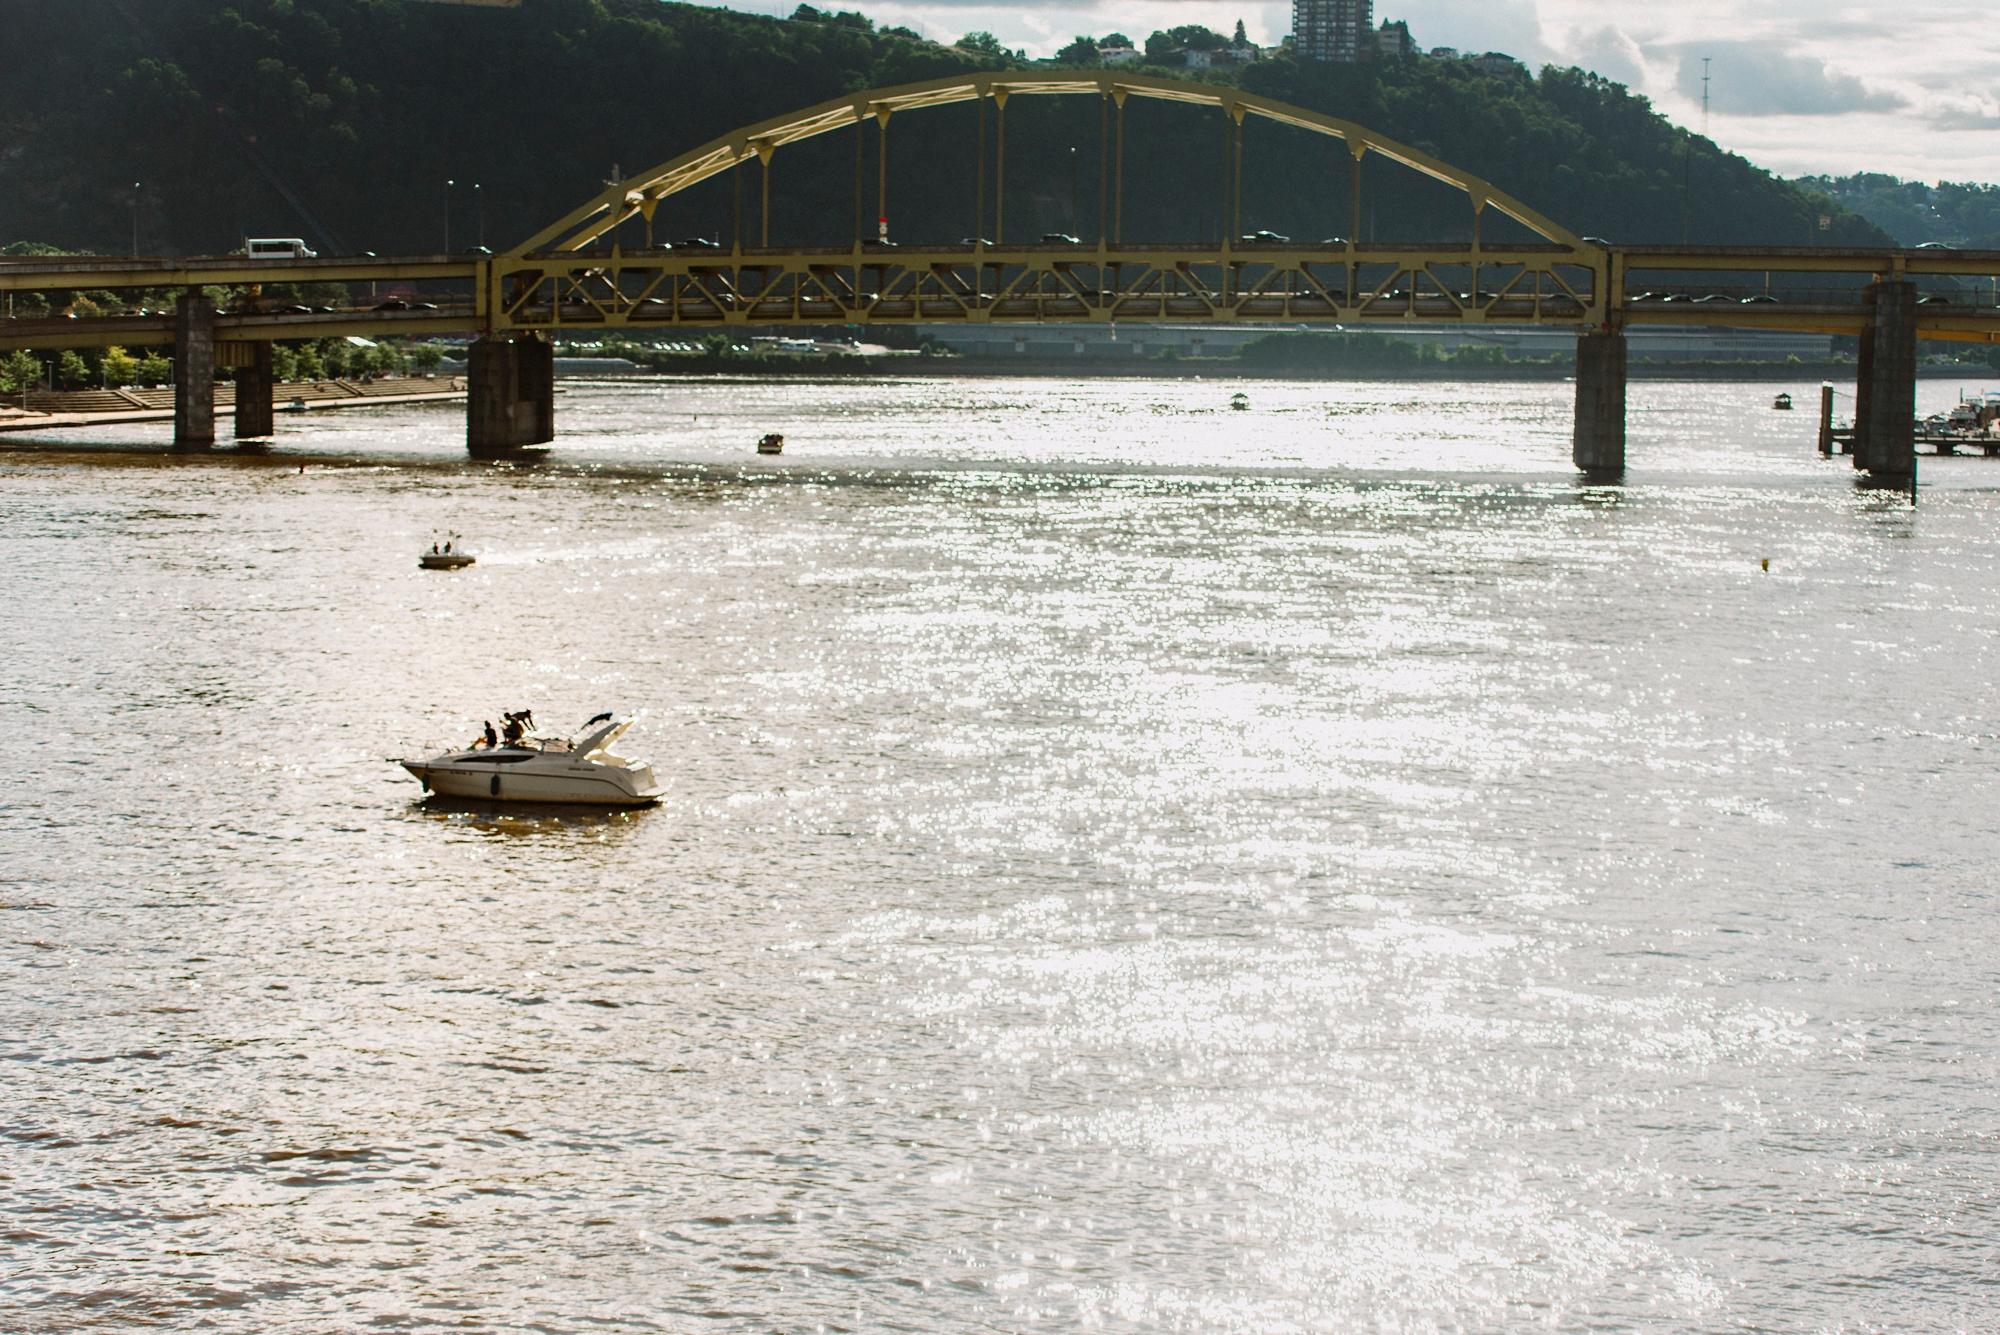 0107Jorge-Clara-Proposal-Pittsburgh_Proposal-Pittsburgh-Constructed-Adventures-Sandrachile.jpg